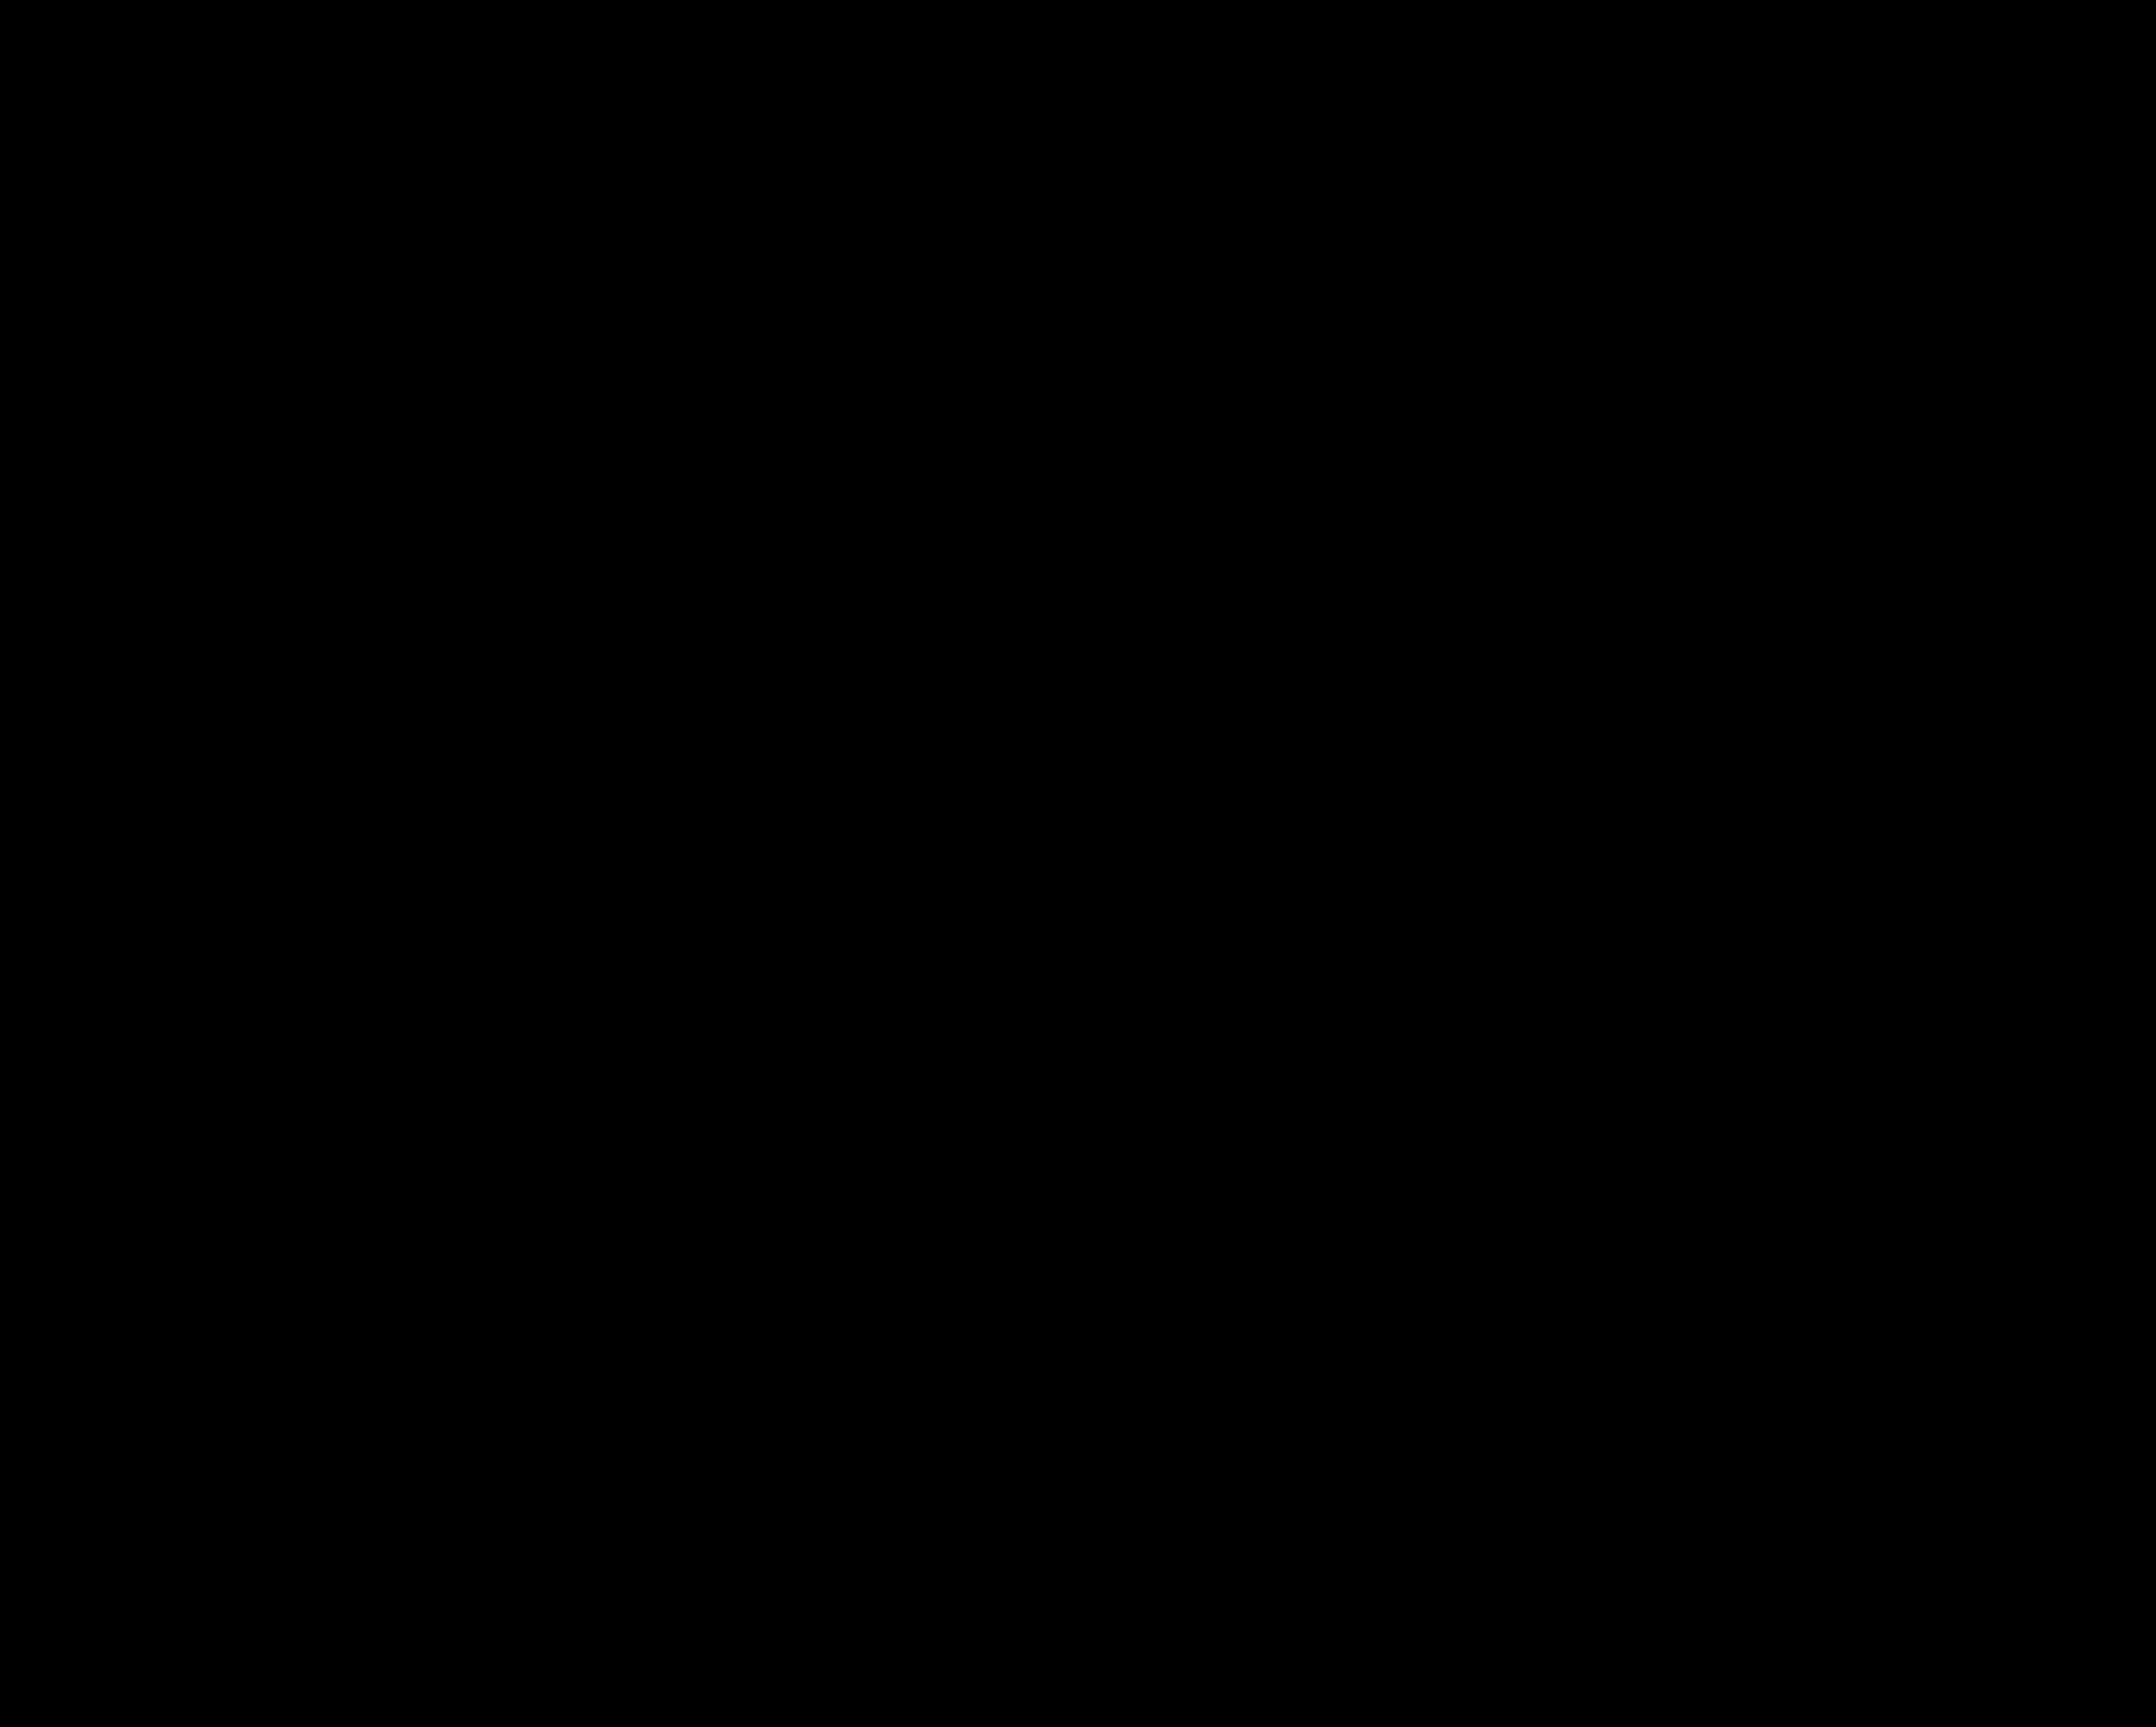 unrealEngine_logo.png